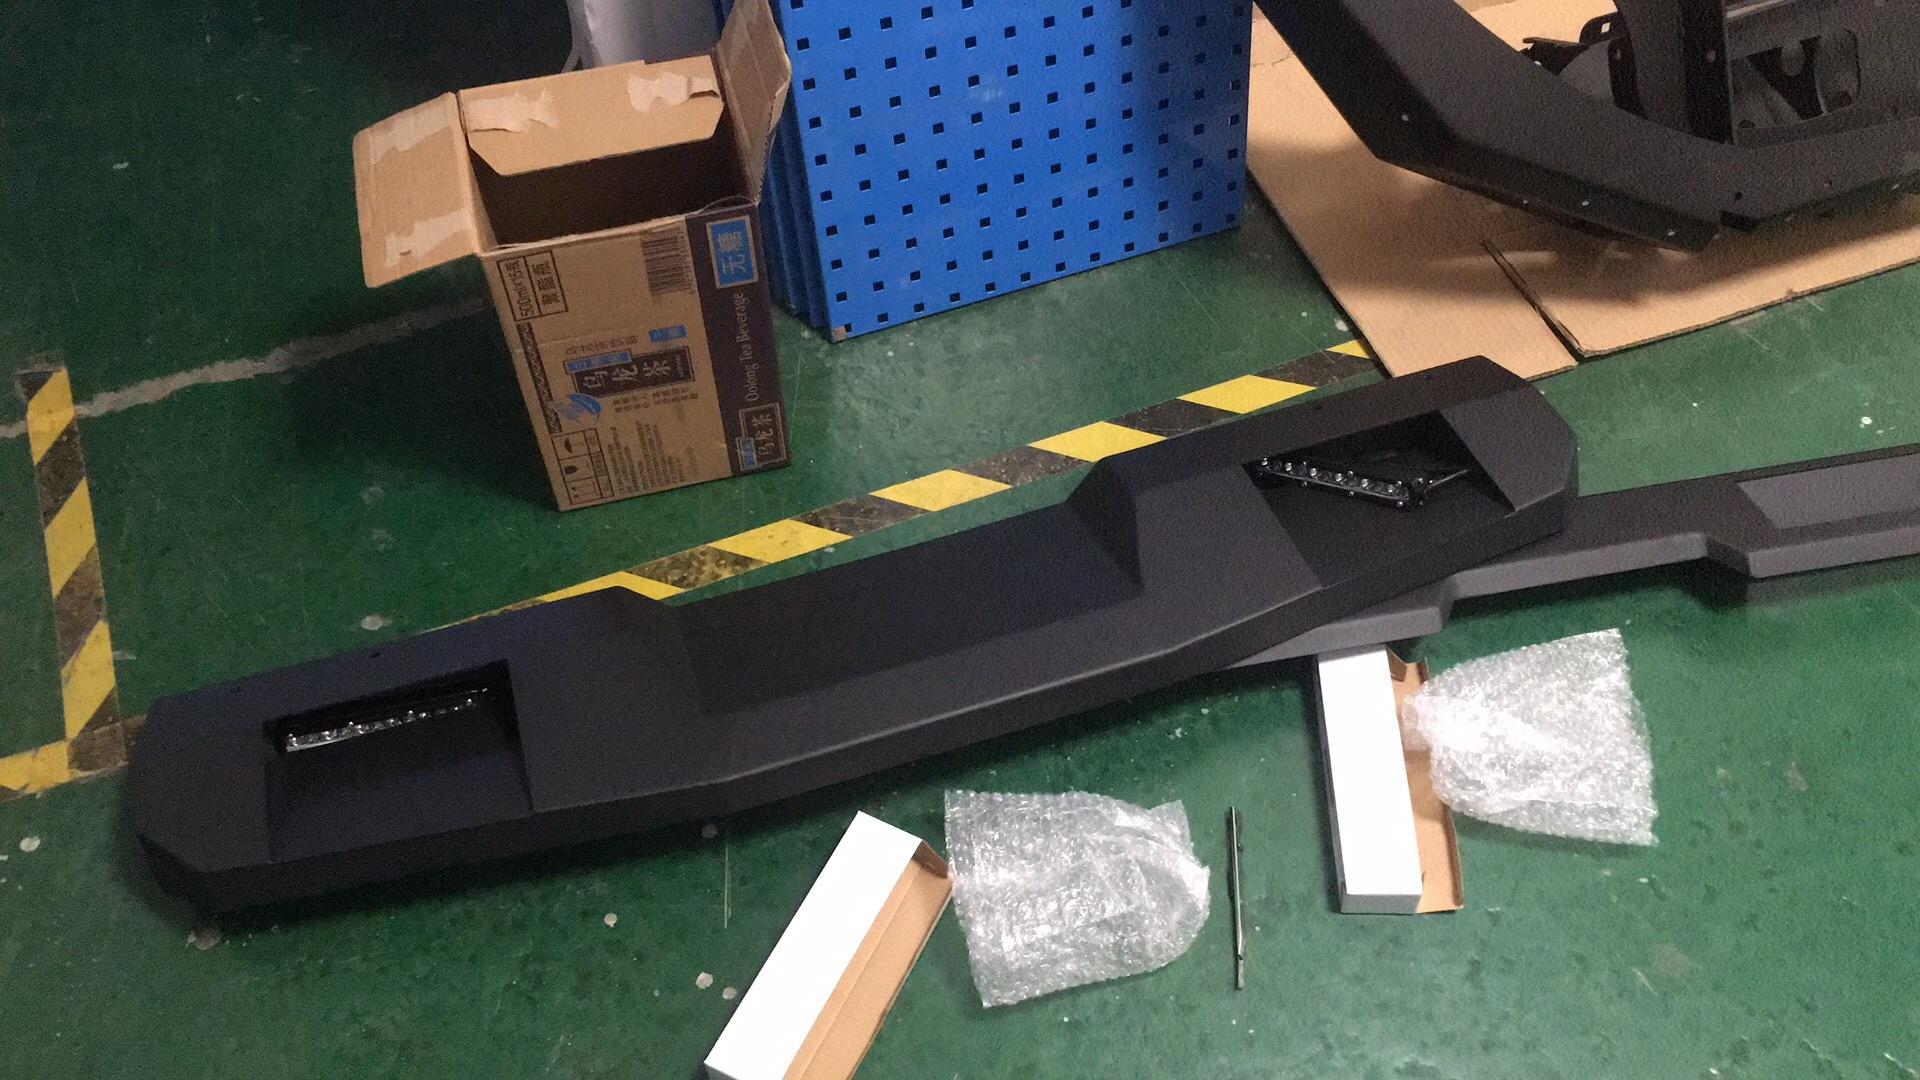 Спойлер передний на крышу для Suzuki Jimny NEW 2019 - комплект противотуманных светодиодных фар в передний бампер osram led nsw osr для suzuki jimny new 2019